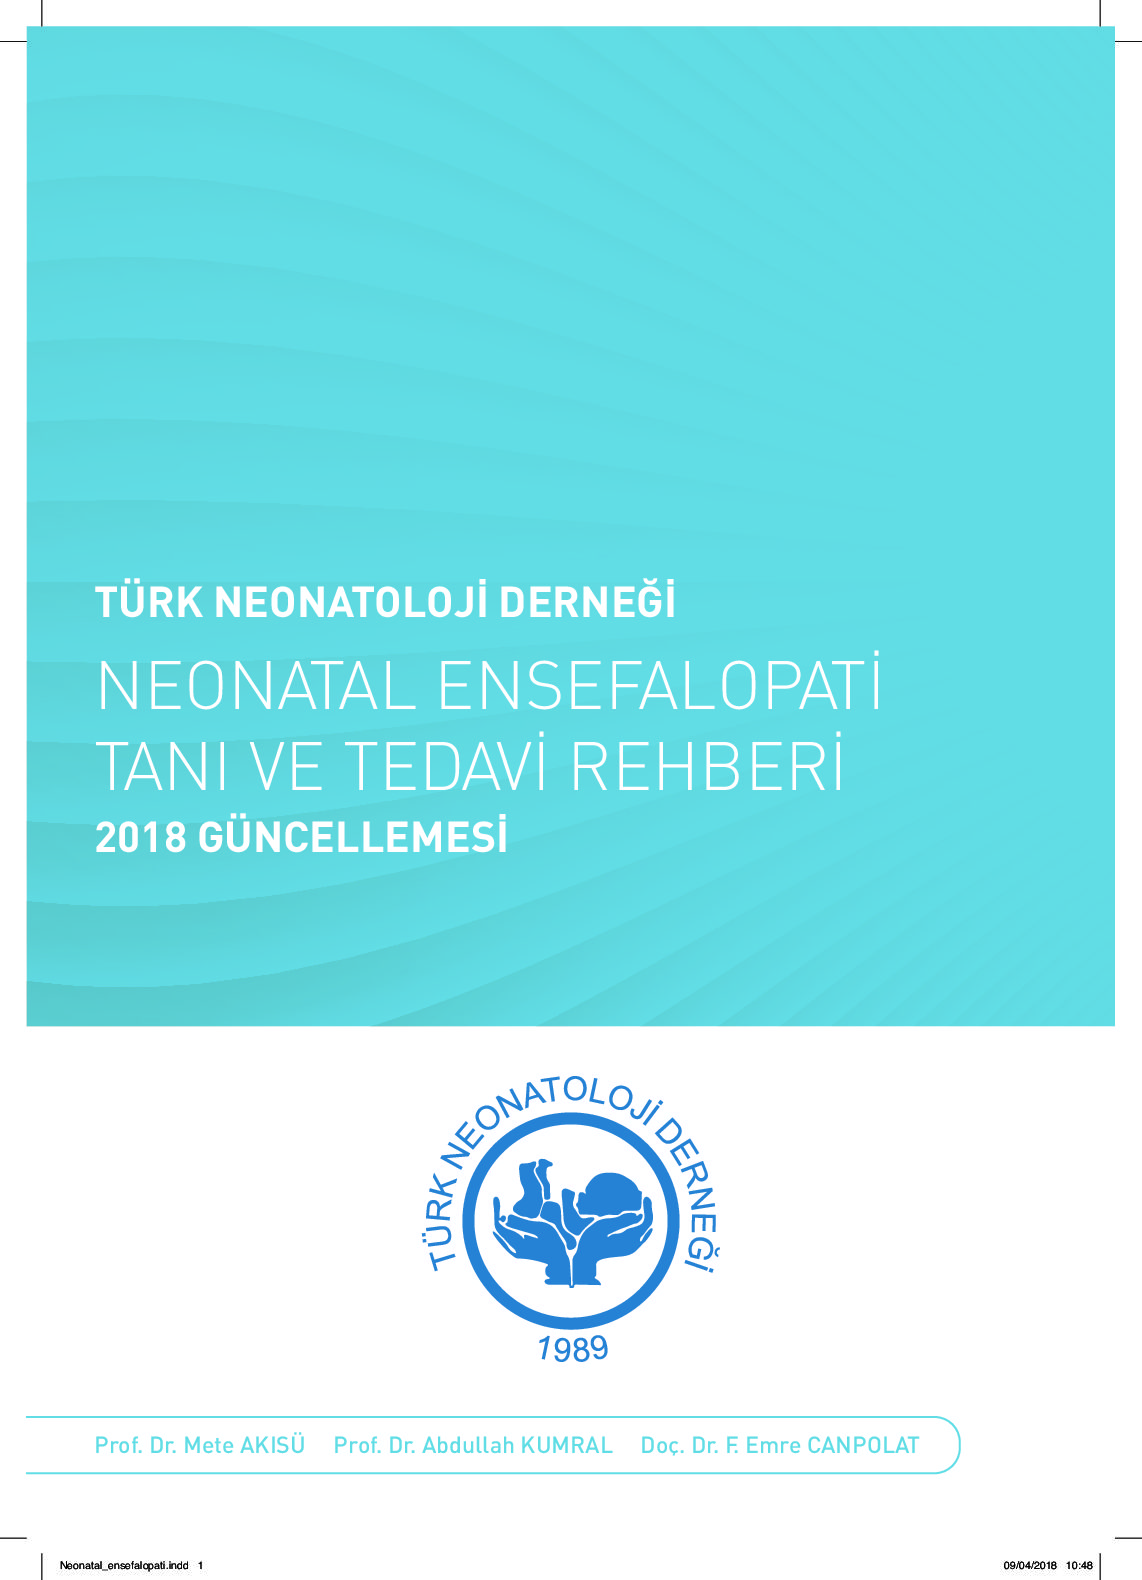 thumbnail of Neonatal Ensefalopati Tanı ve Tedavi Rehberi - 2018